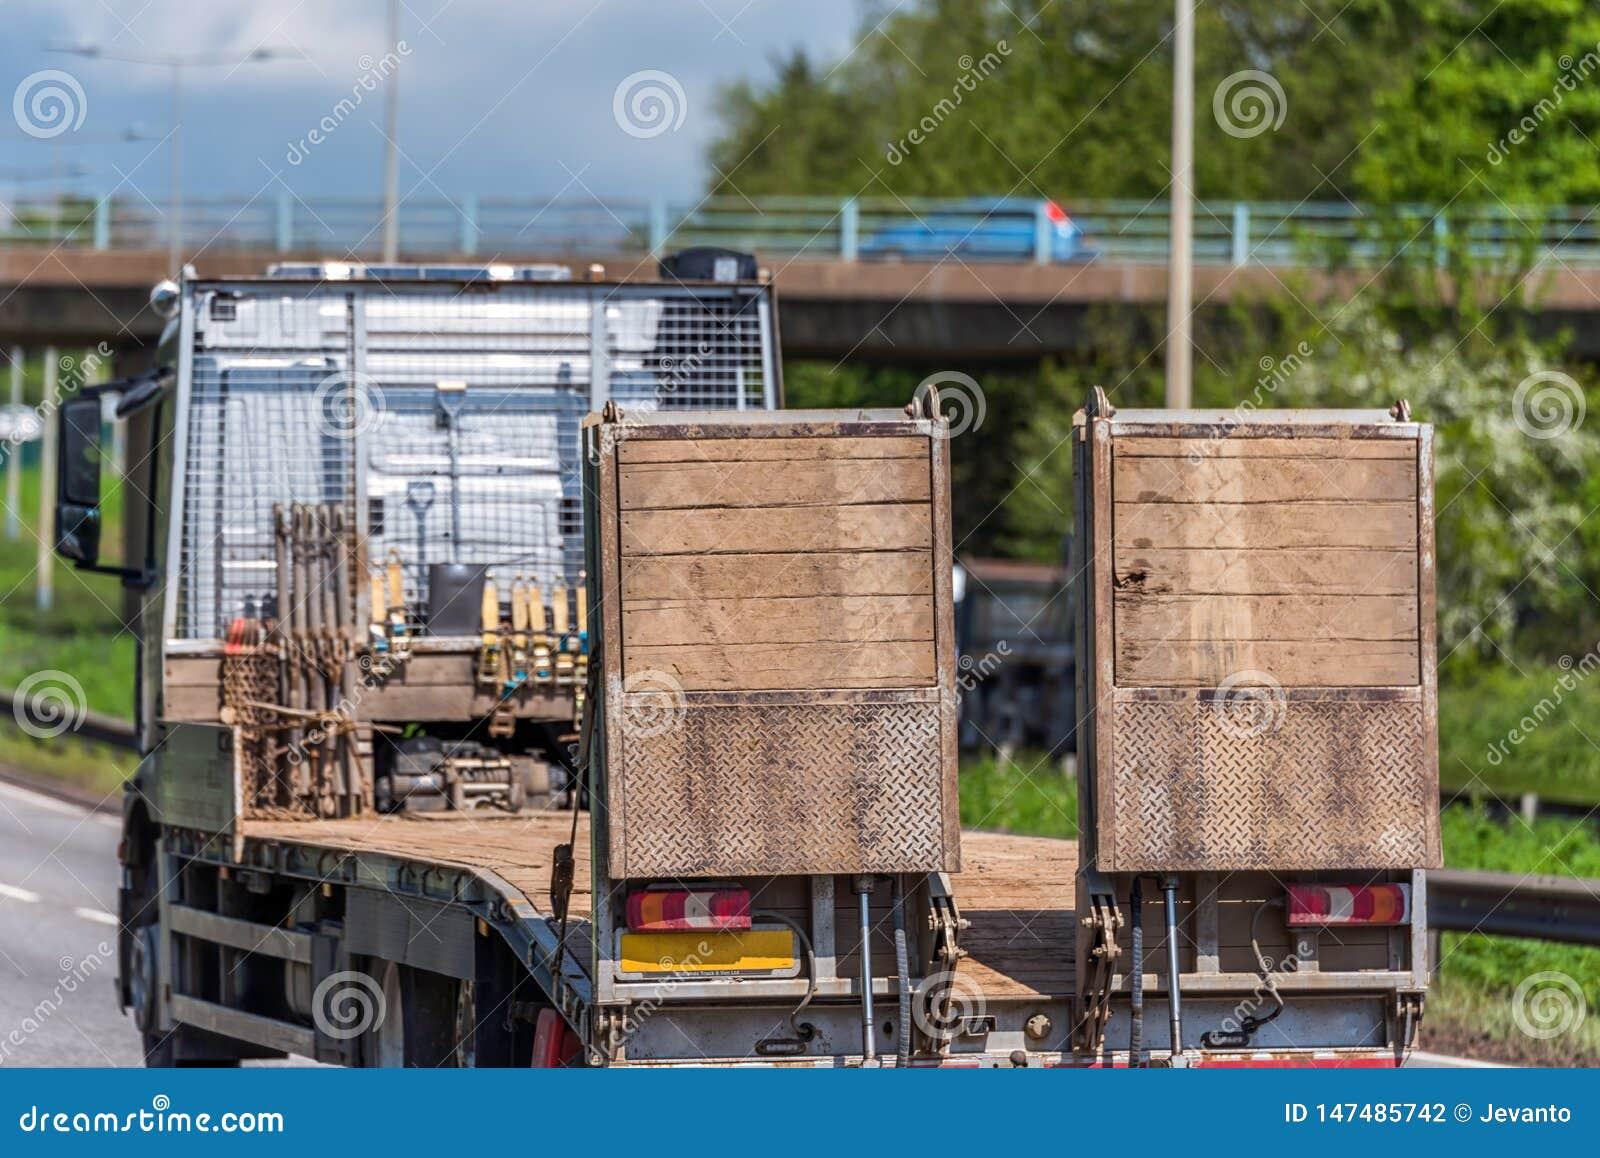 Empty haulage trailer truck on uk motorway in fast motion